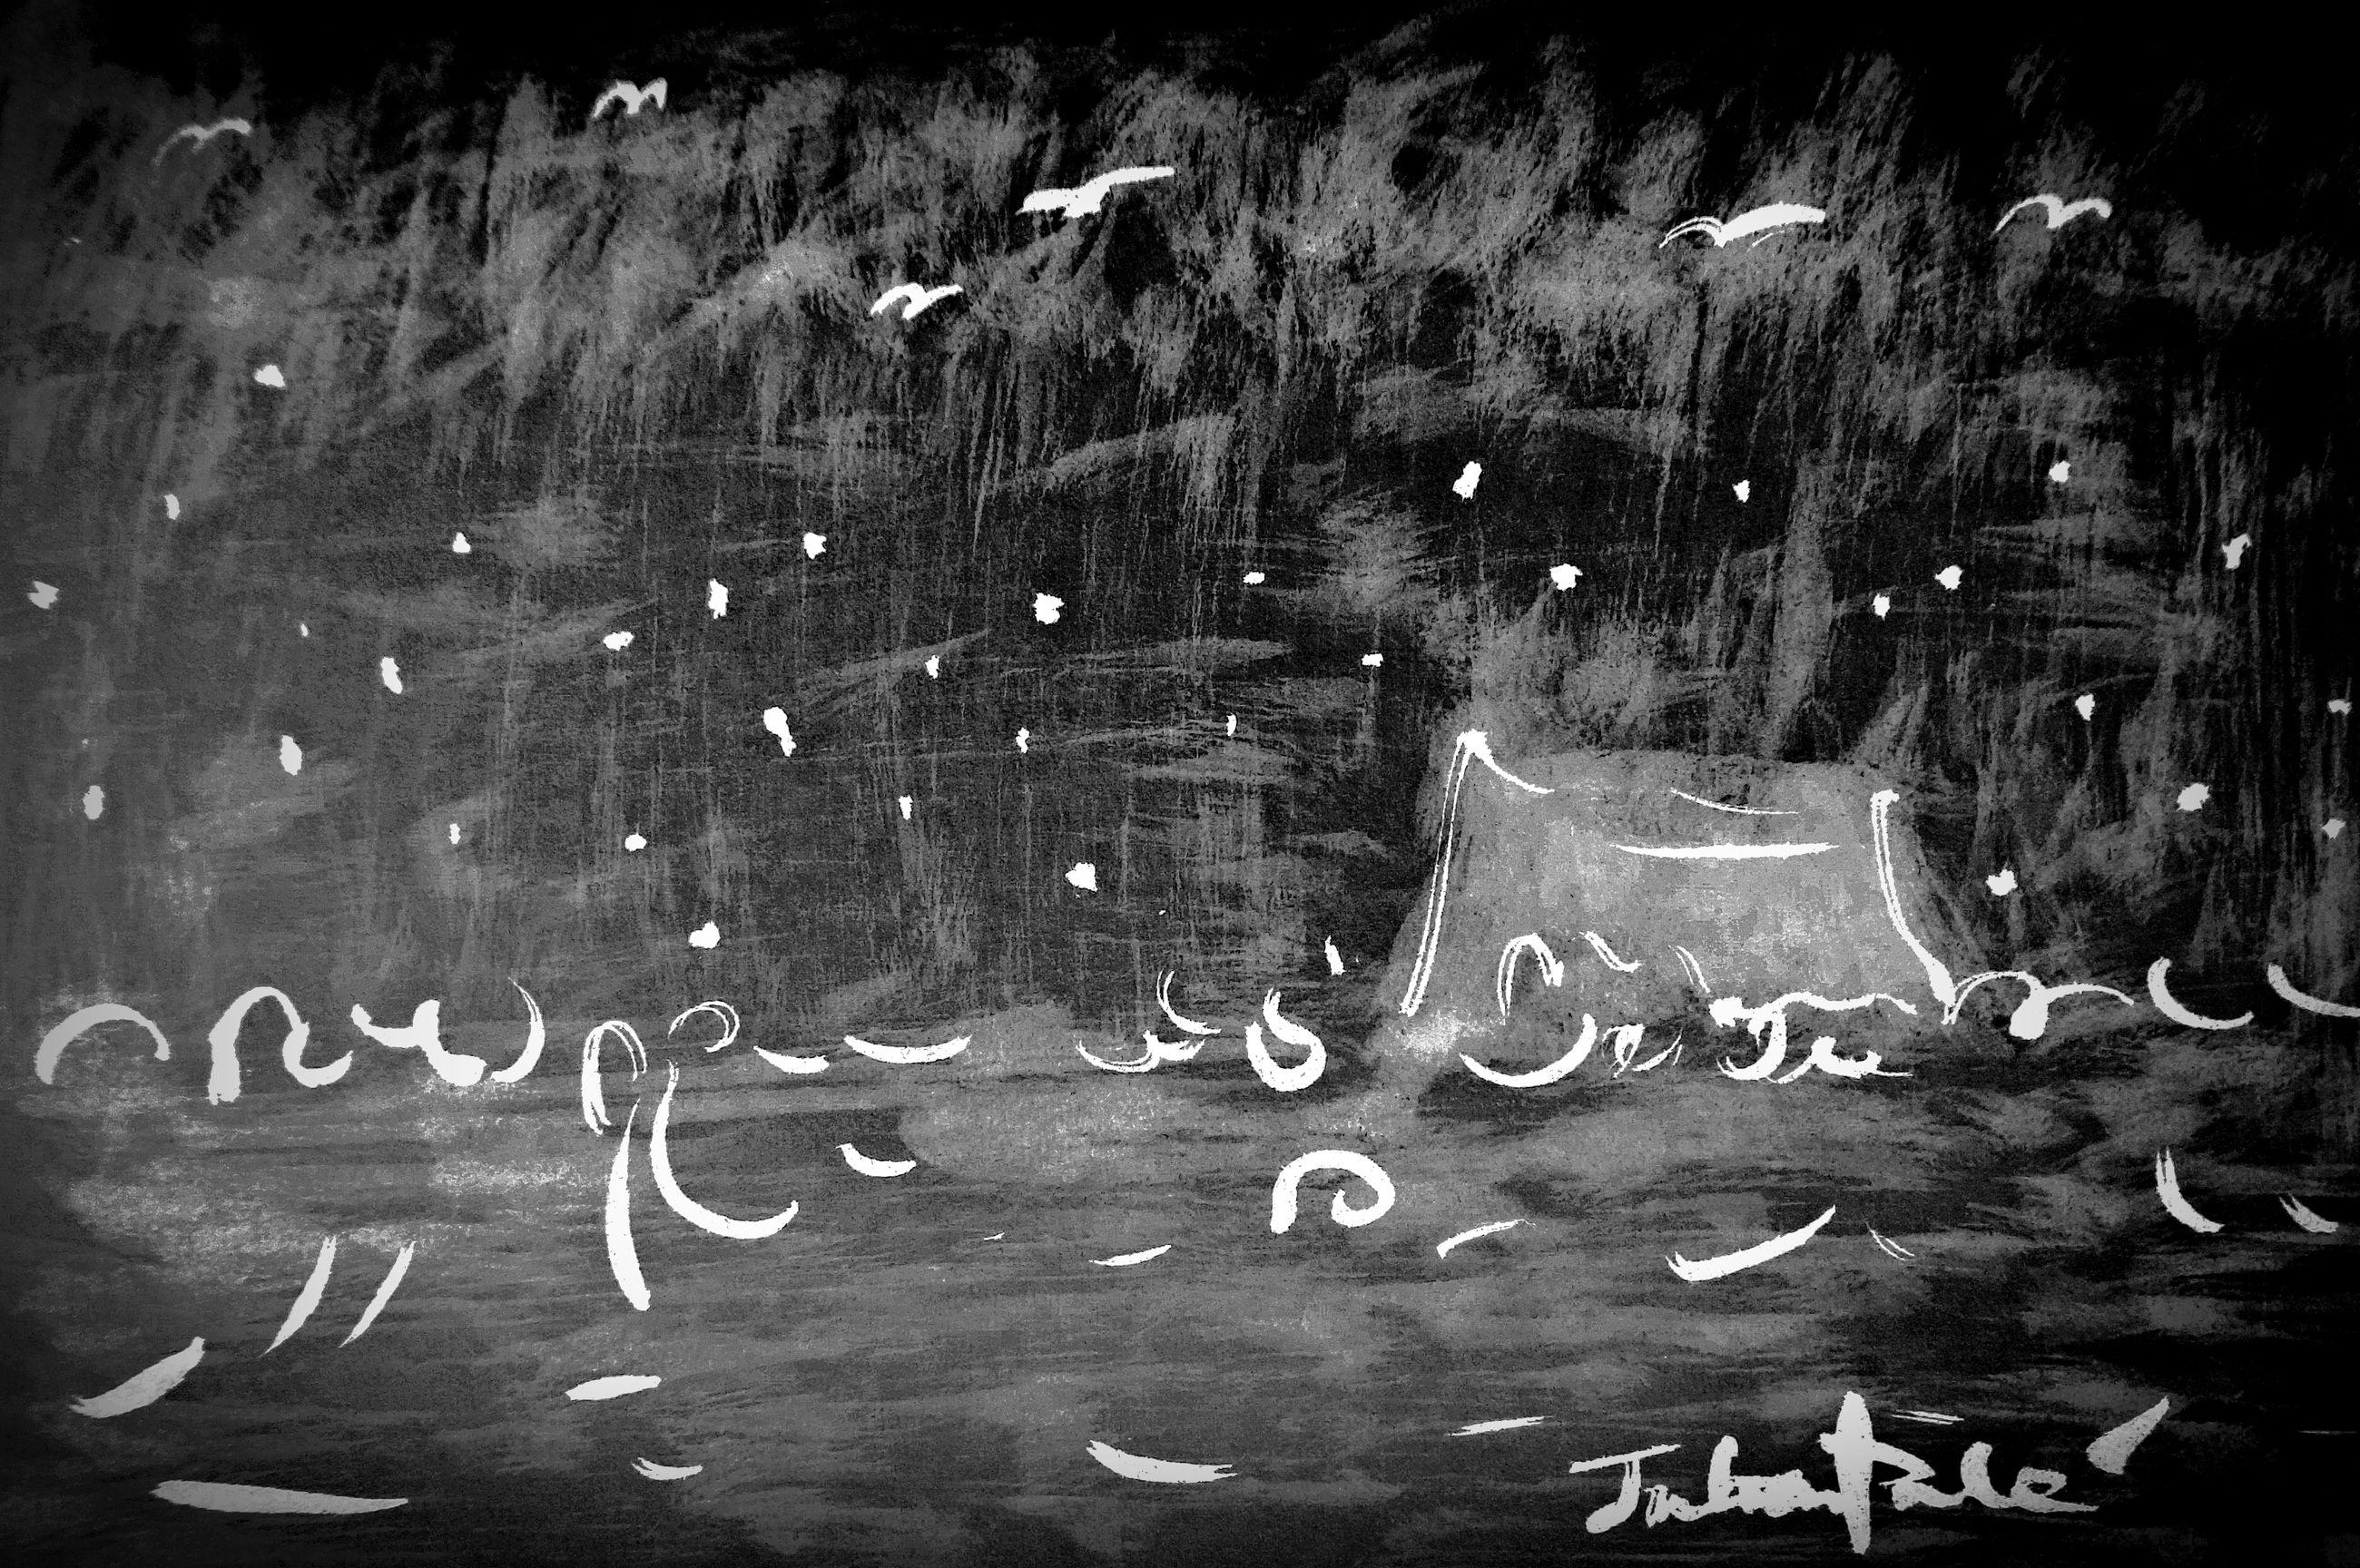 text, western script, communication, night, transparent, handwriting, glass - material, no people, graffiti, emotion, illuminated, art and craft, window, creativity, architecture, message, indoors, positive emotion, motion, celebration